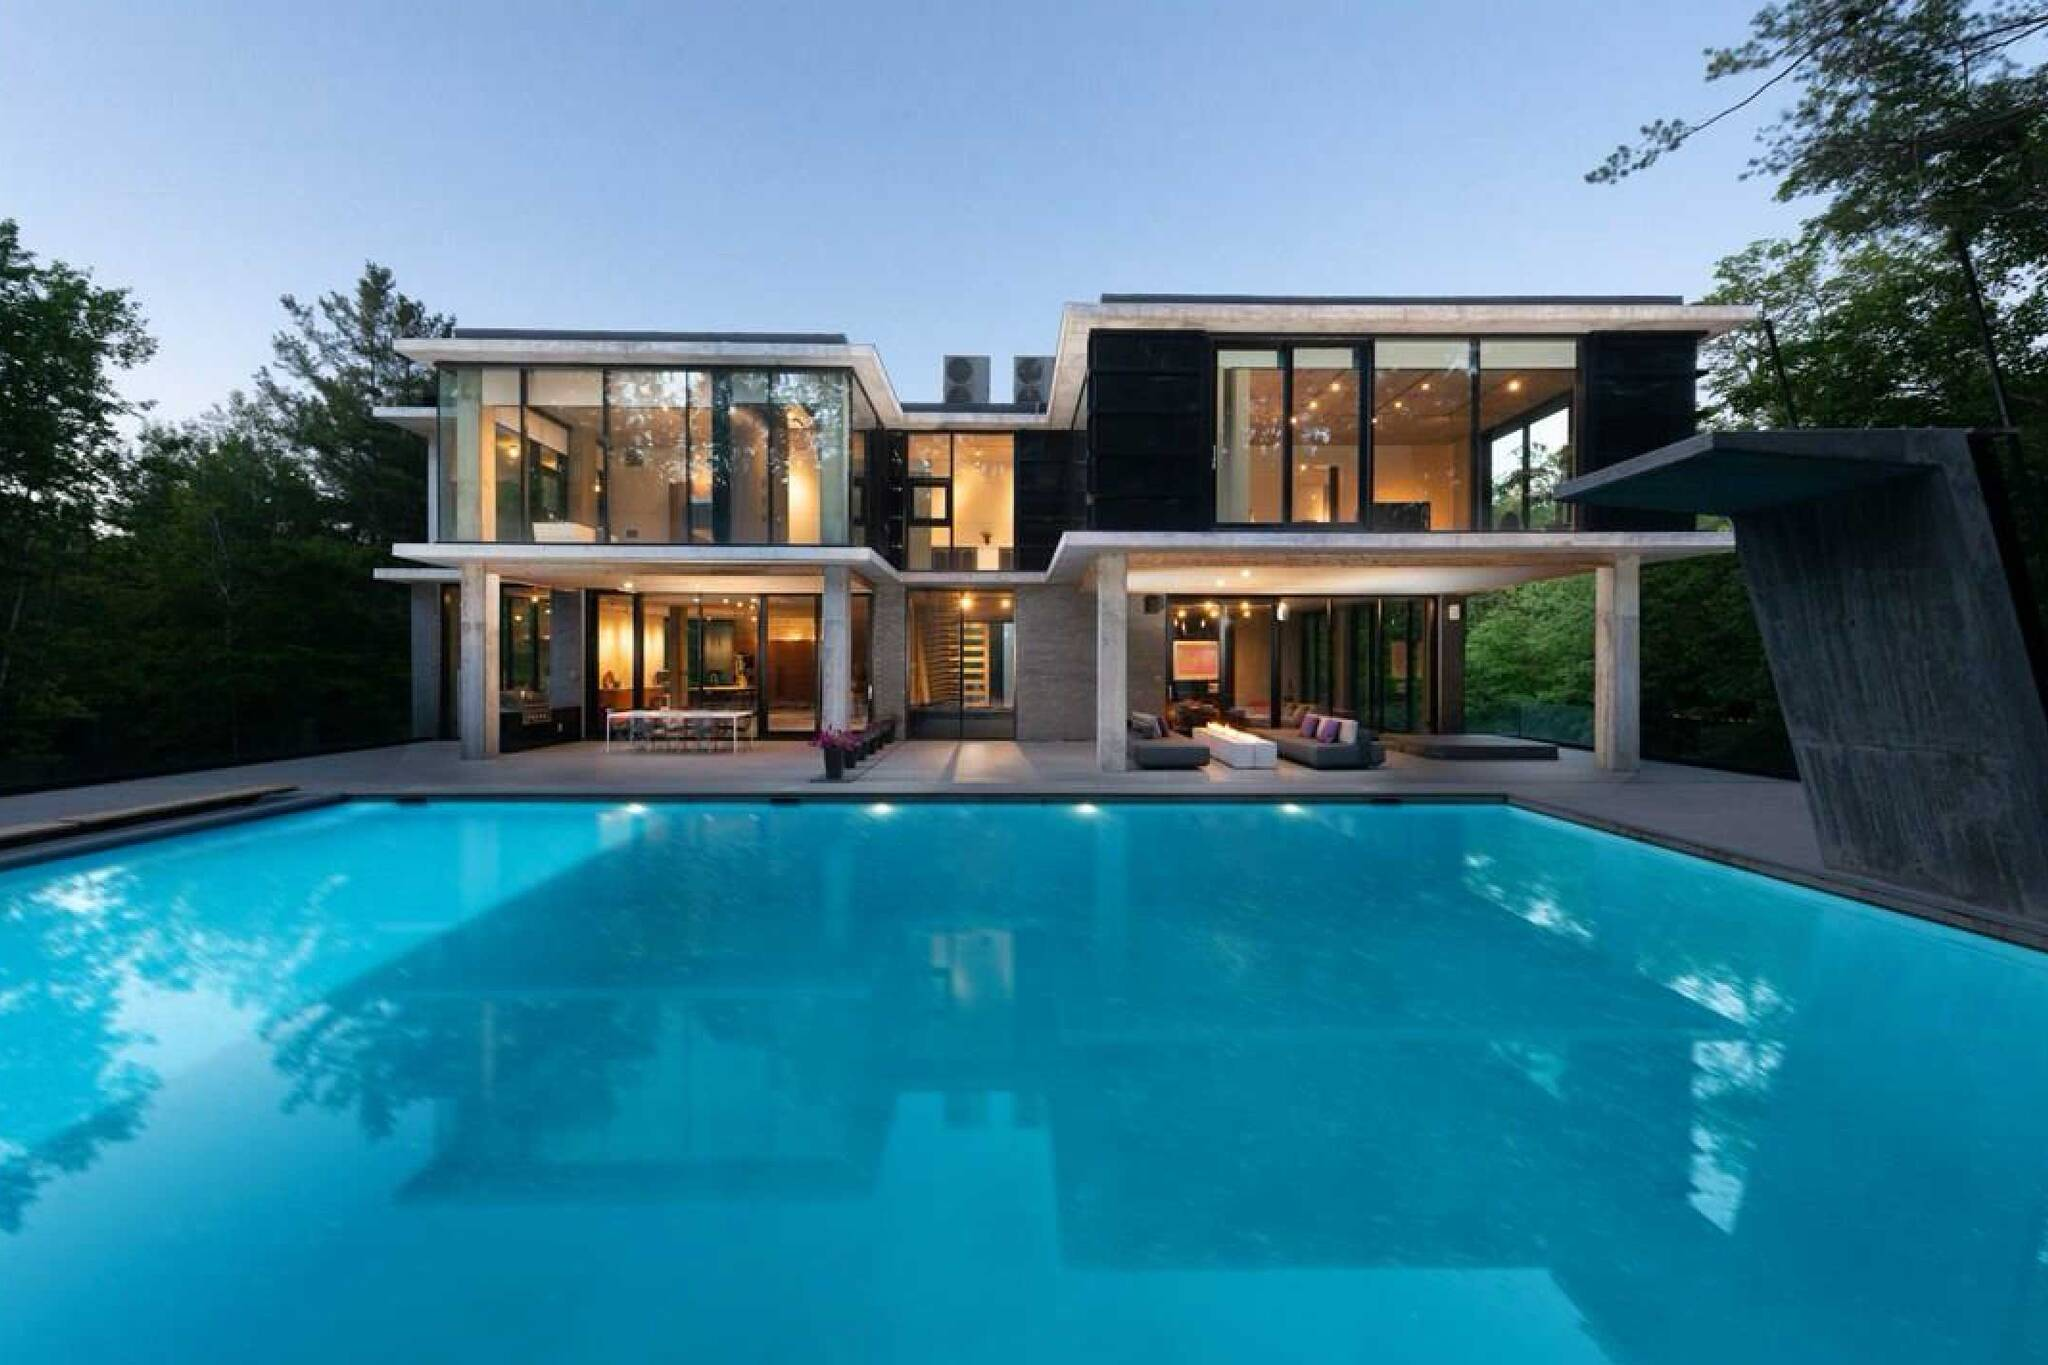 3 million home canada